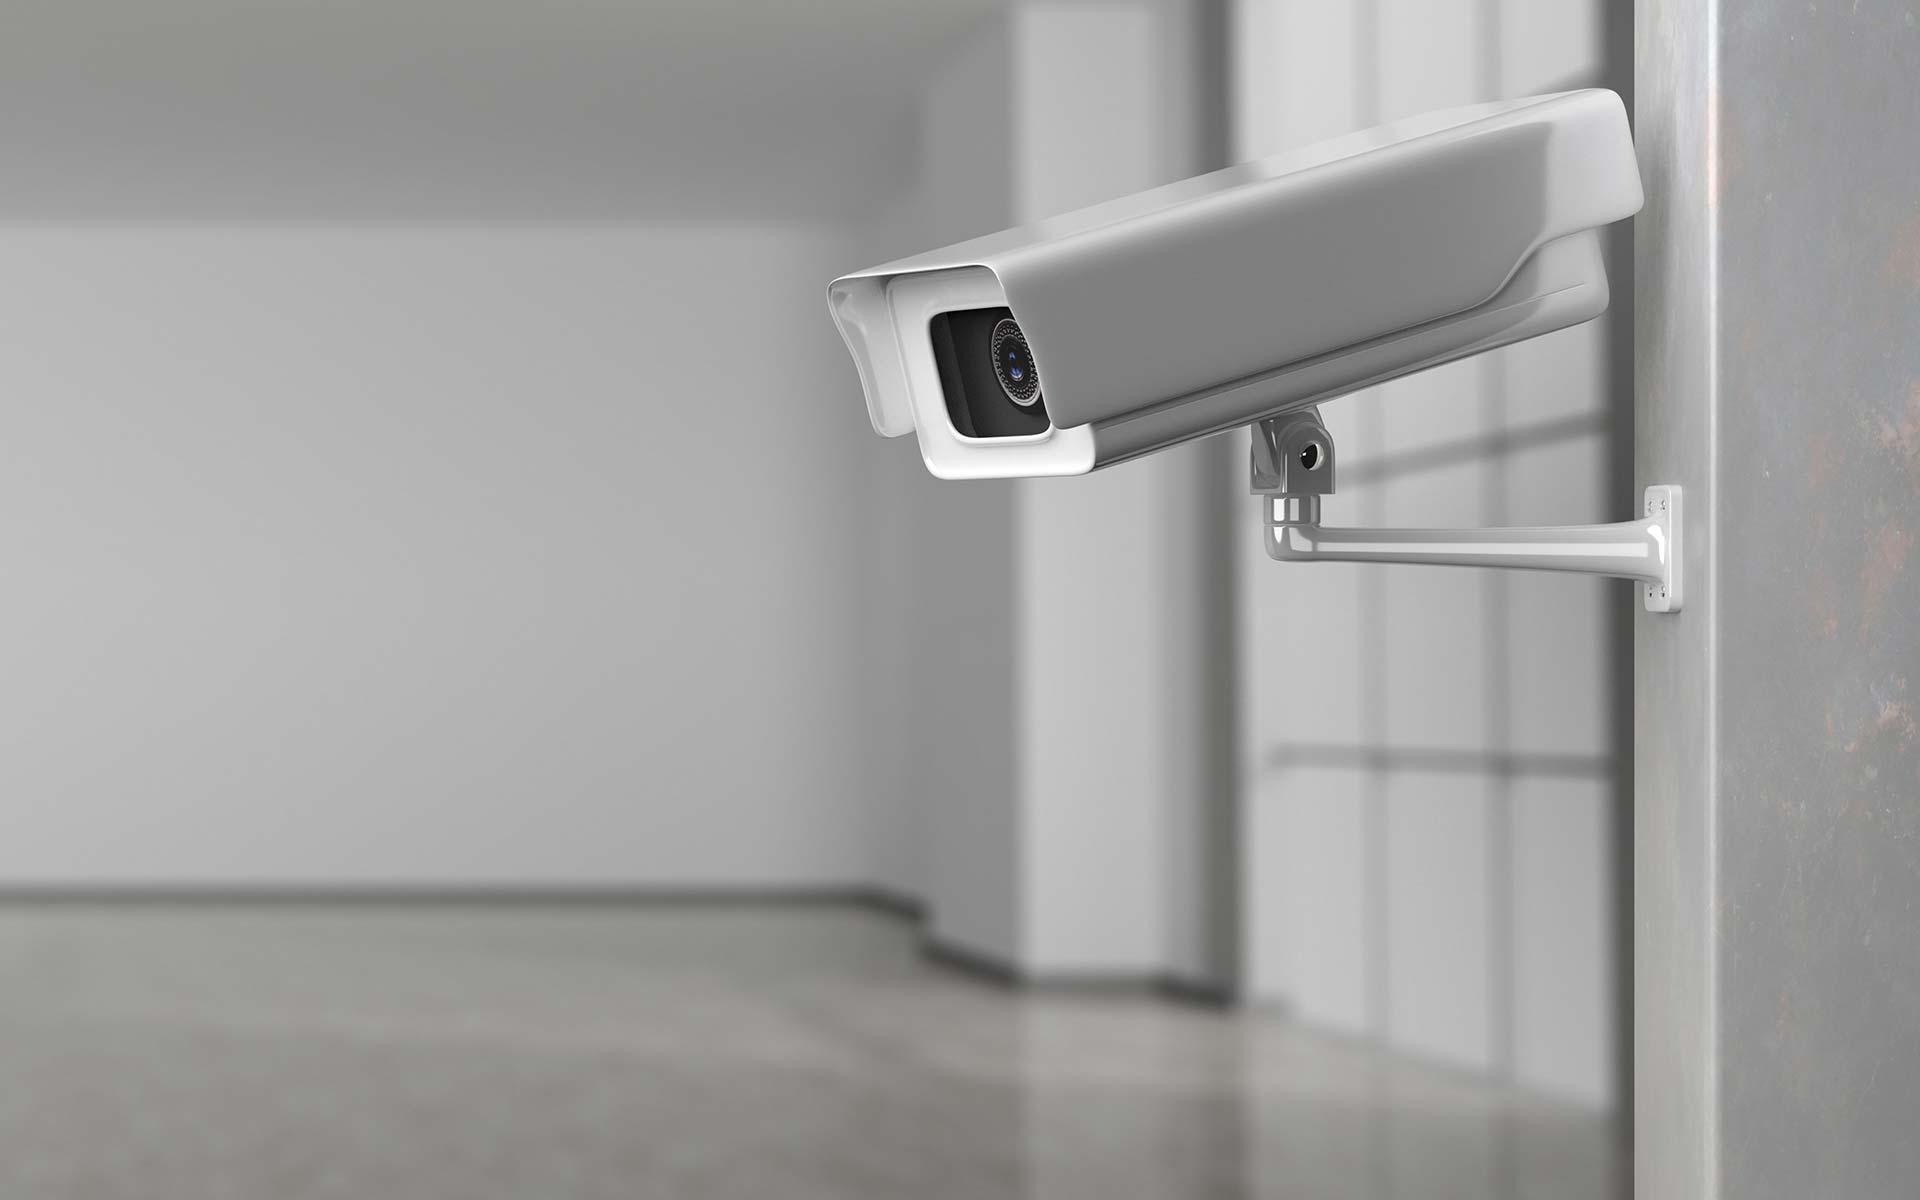 img-videobewaking